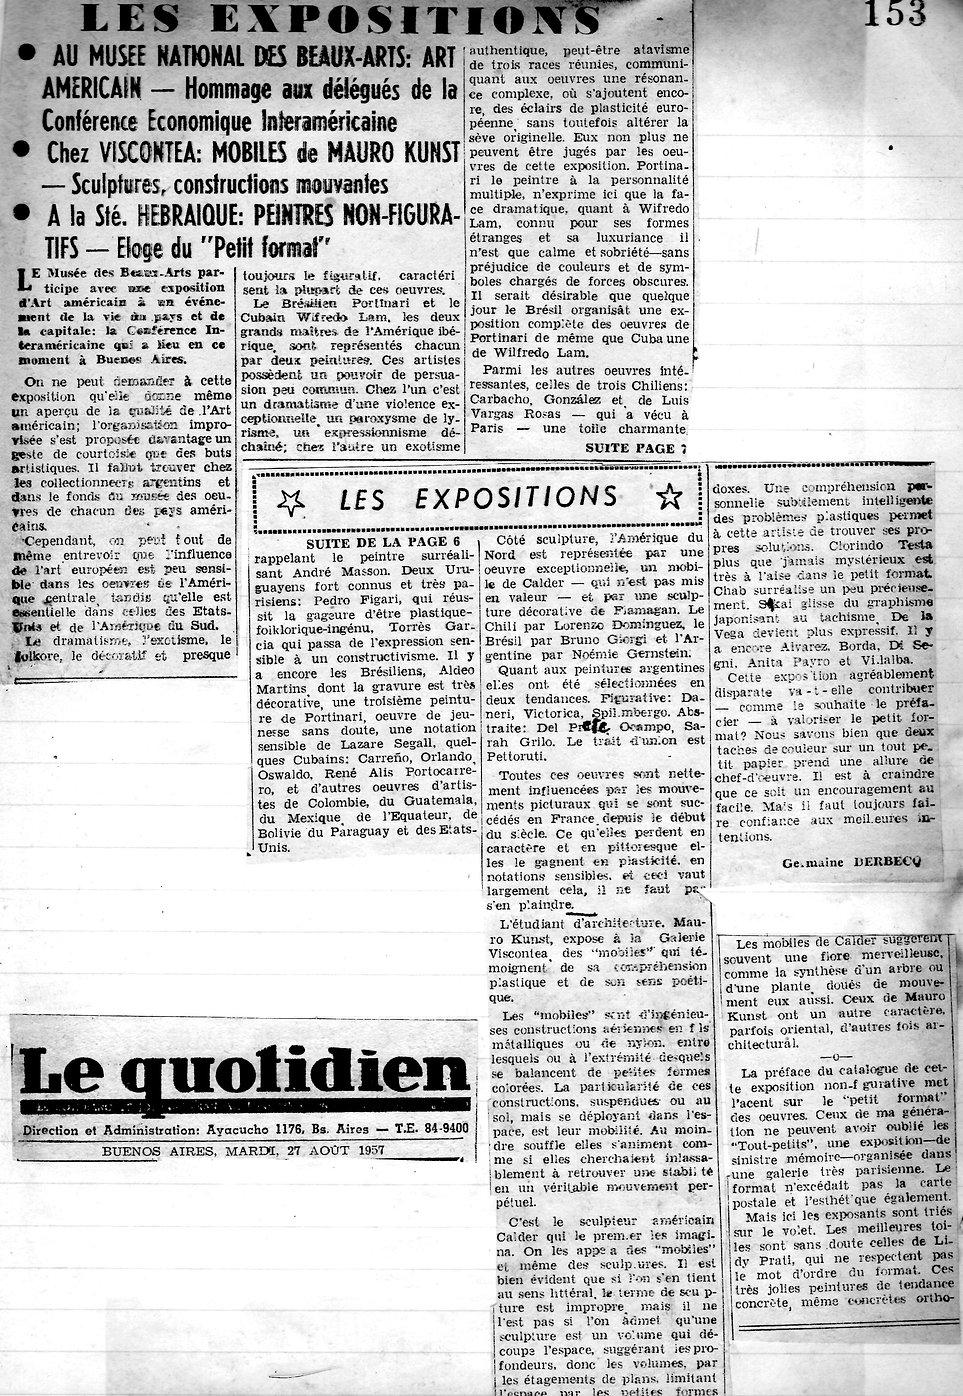 Le Quotidien2 - Au musee national.jpg